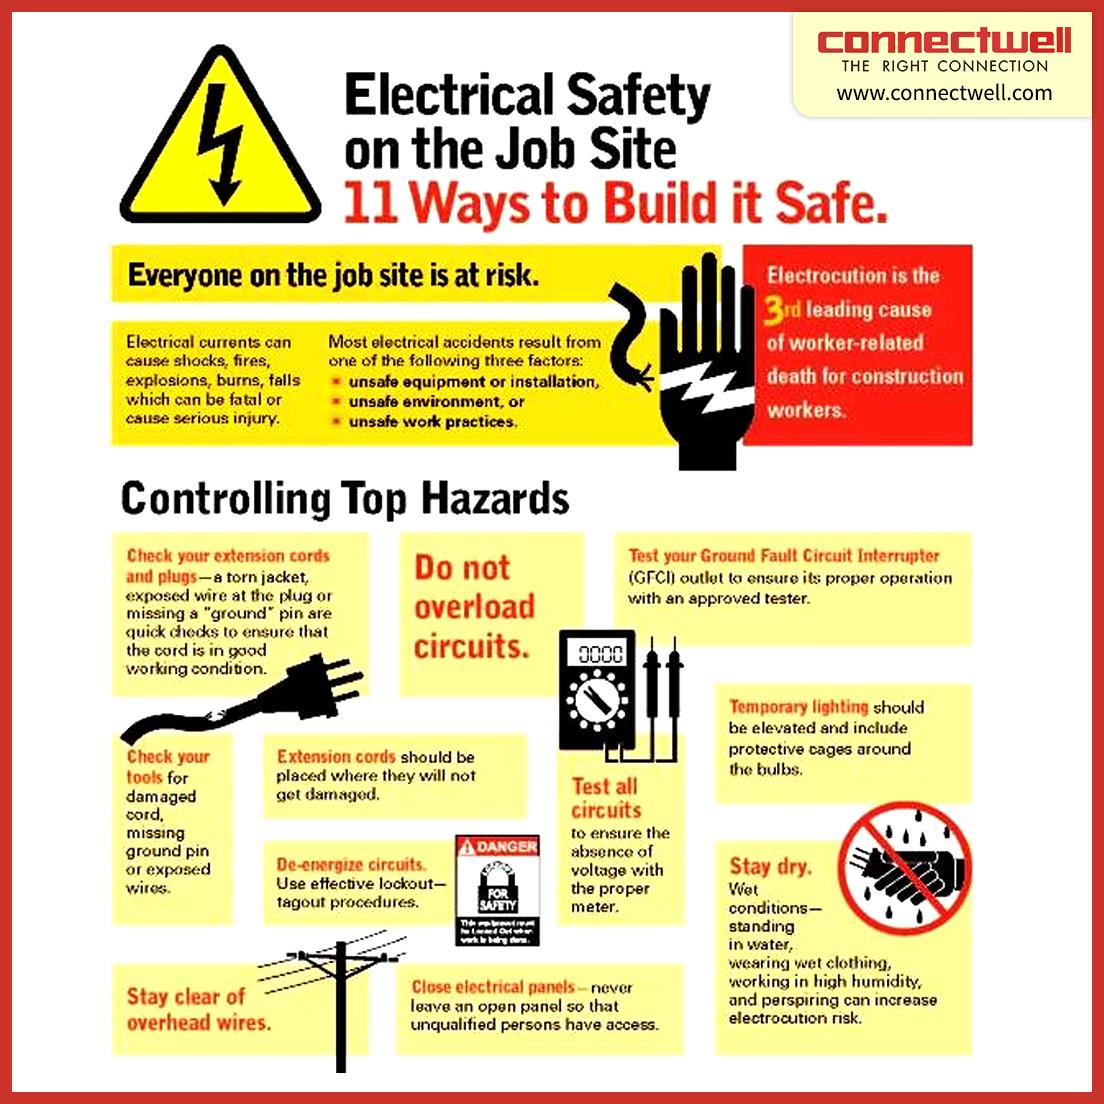 Electrical Safety on the Job Site MondayMotivaton